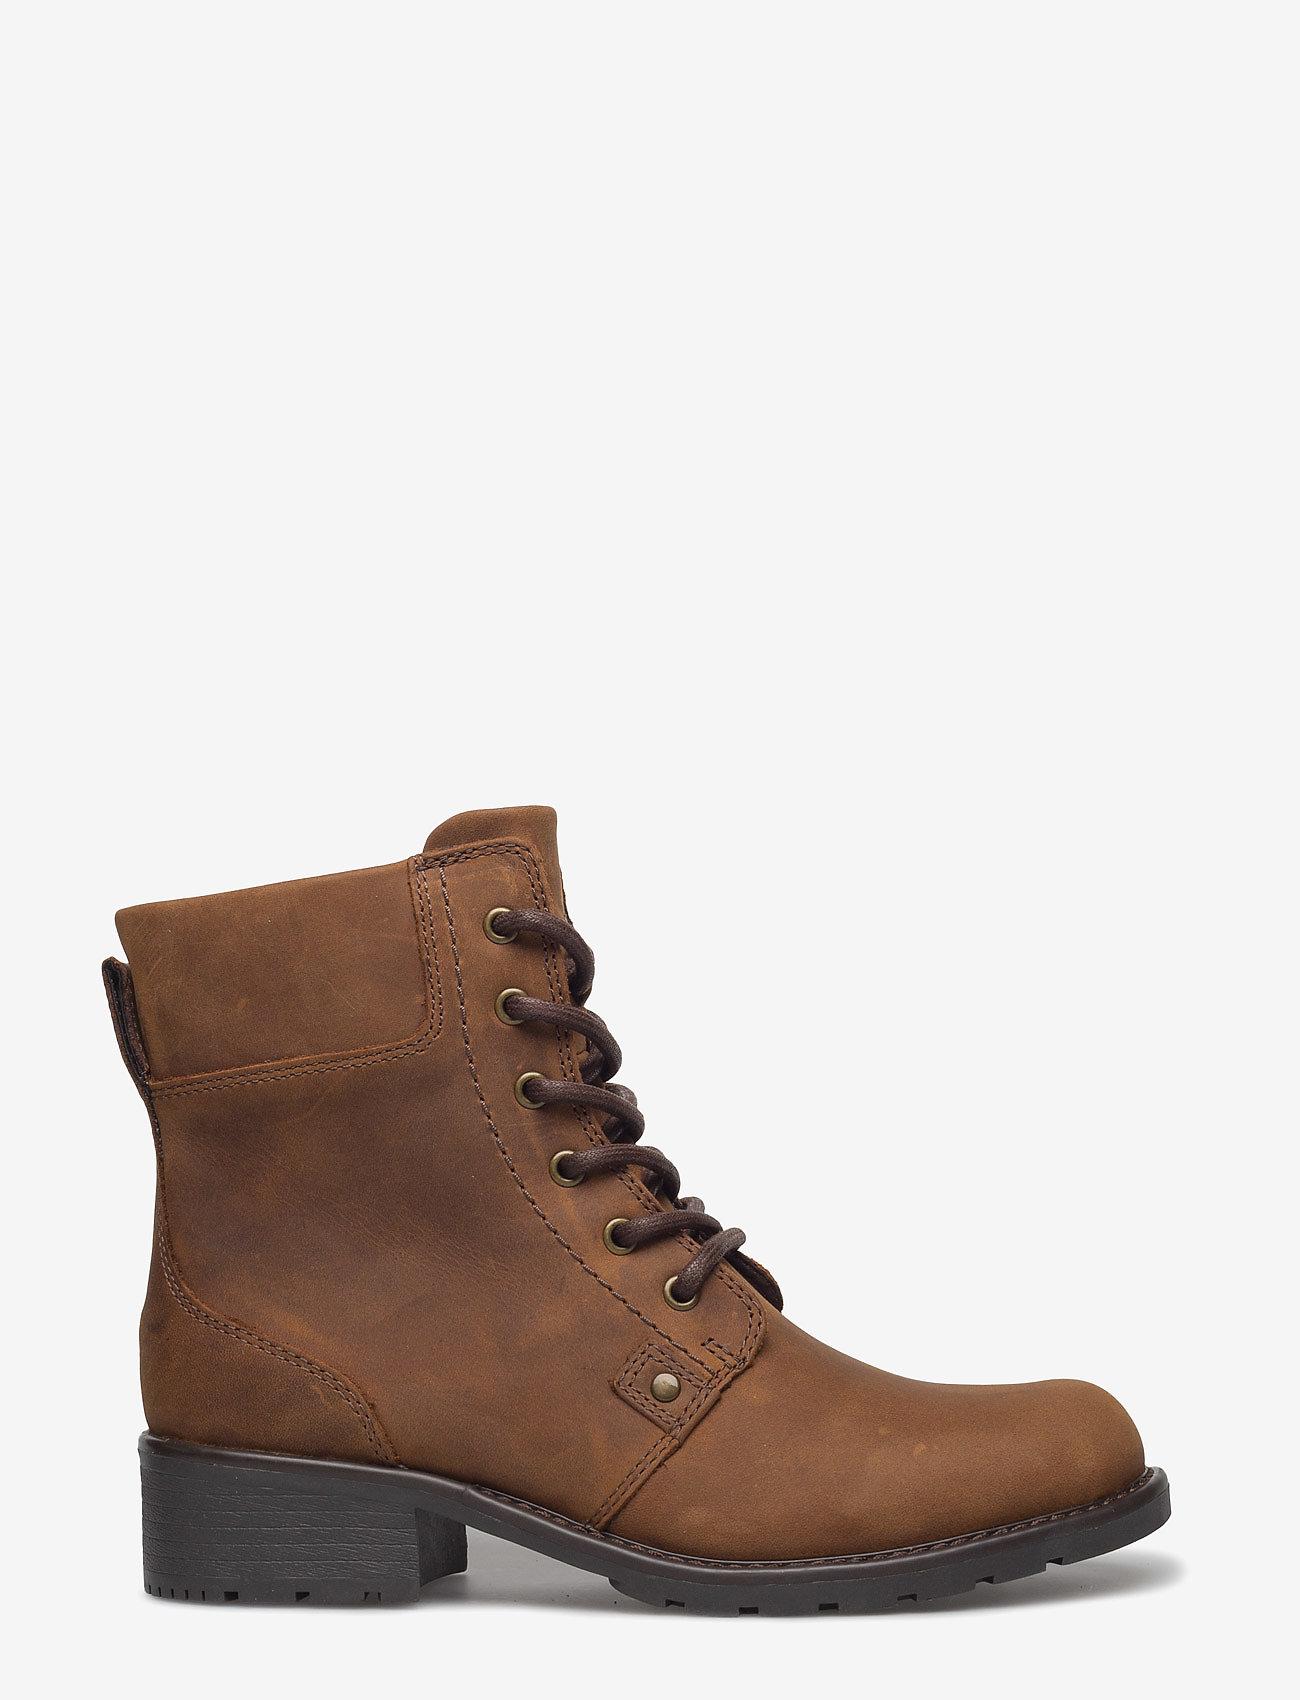 Clarks - Orinoco Spice - flade ankelstøvler - brown snuff - 1